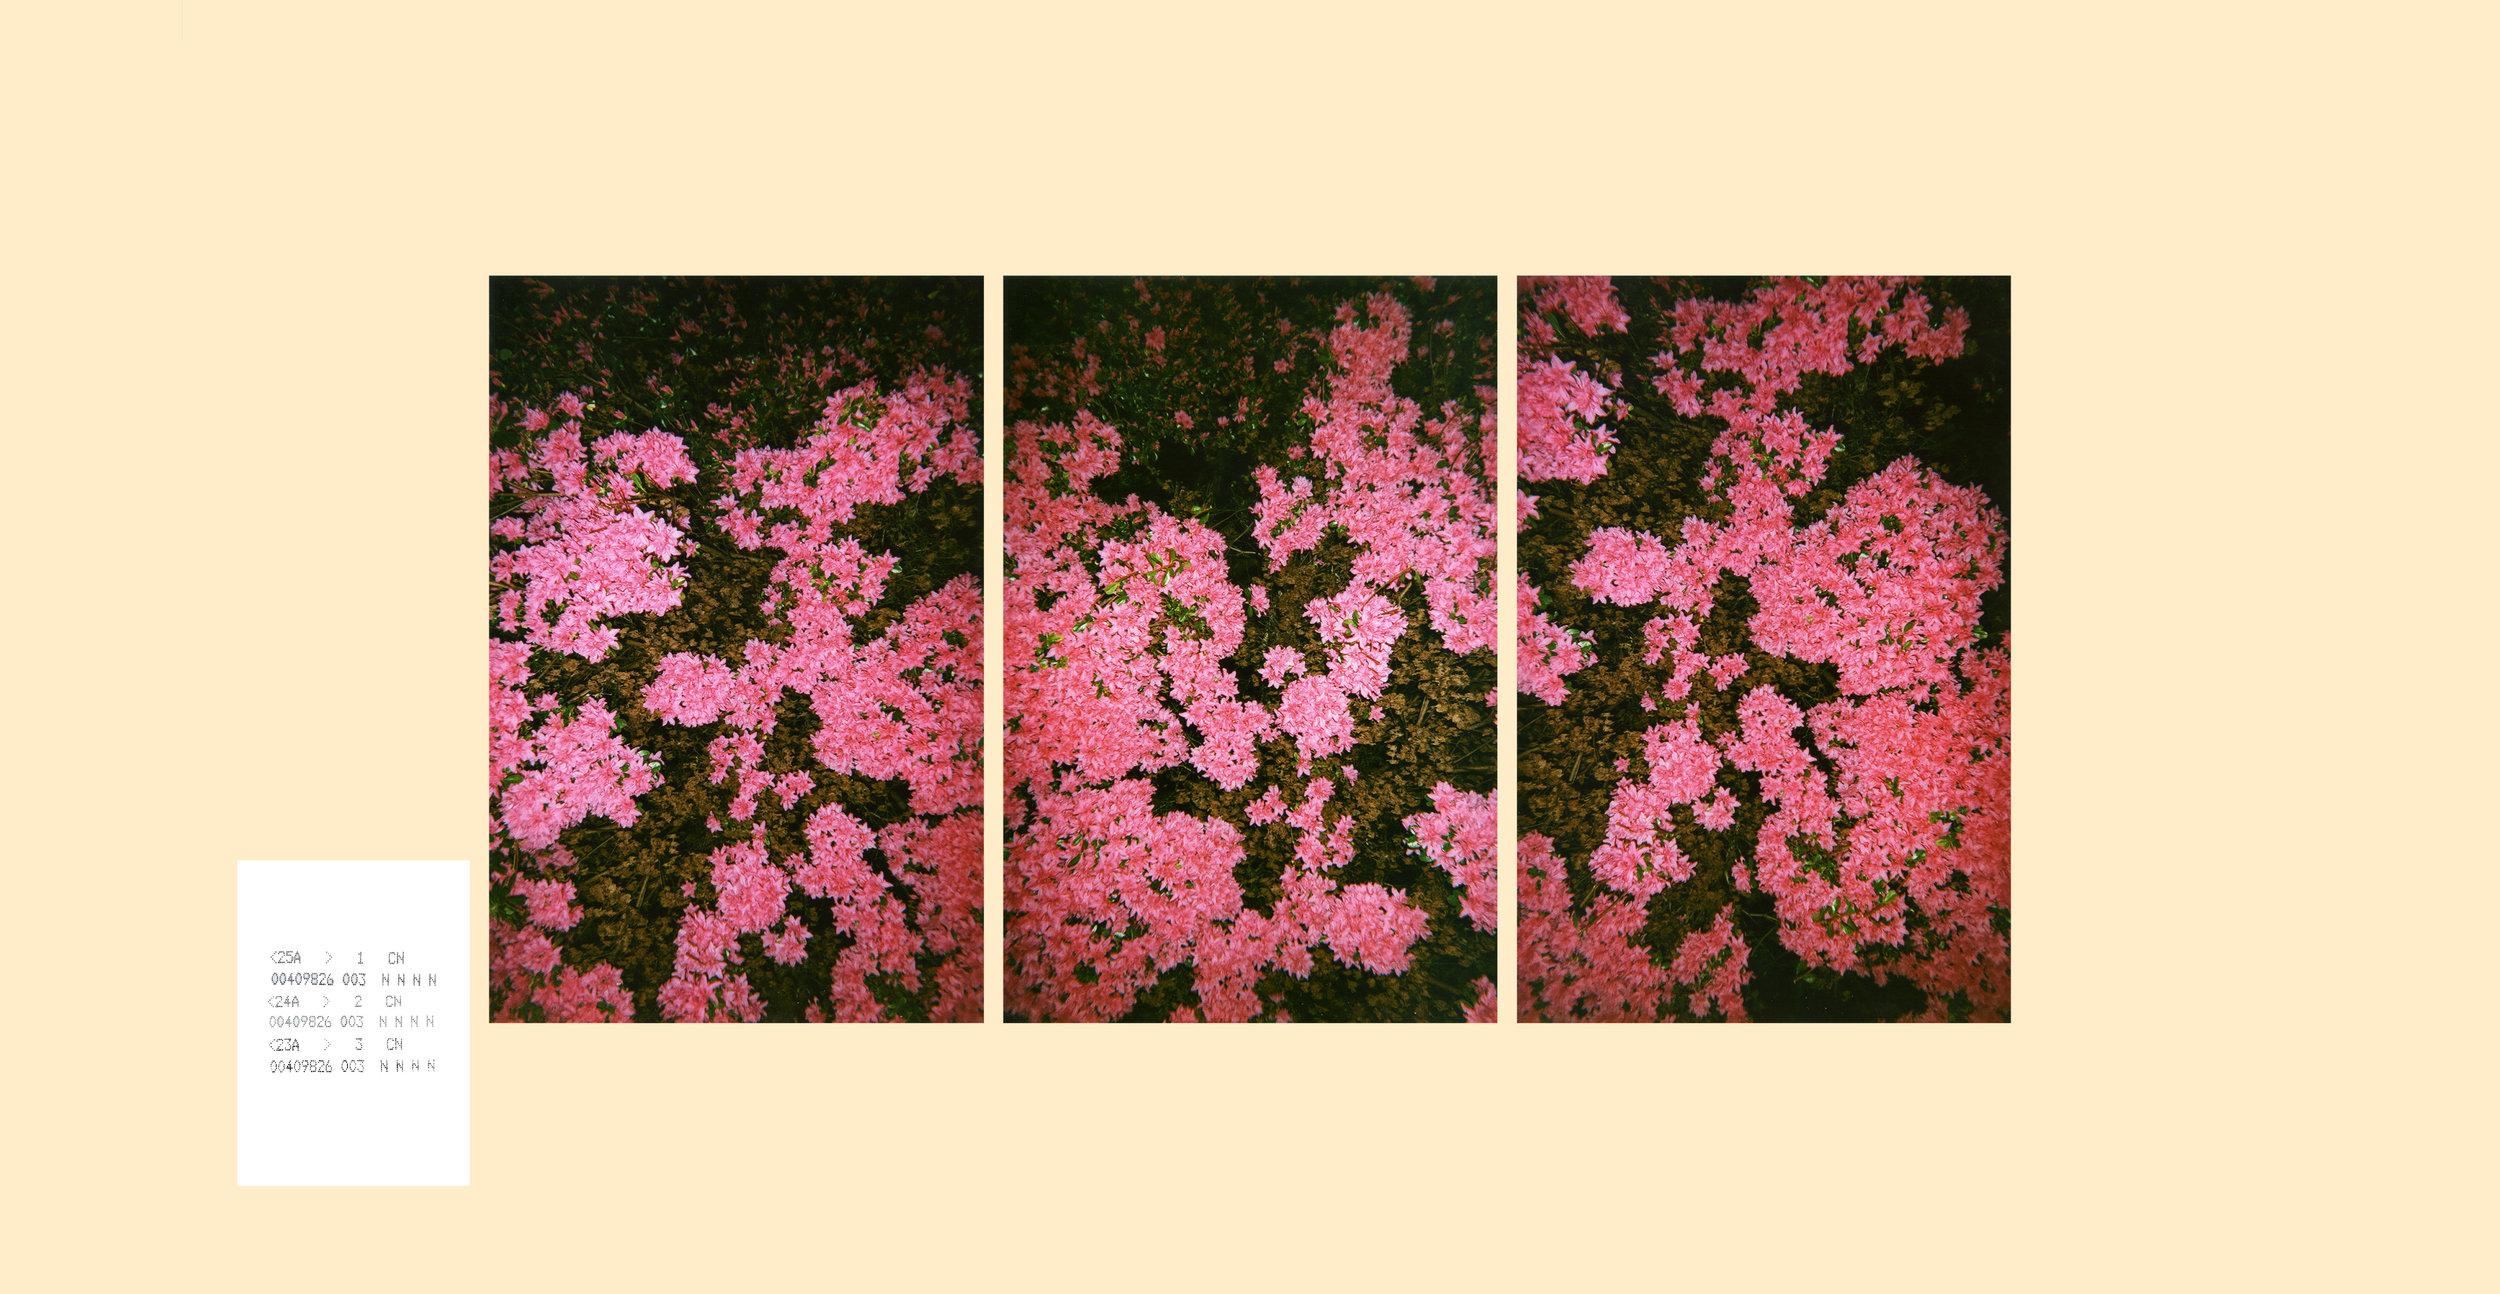 disp.panel.jpg